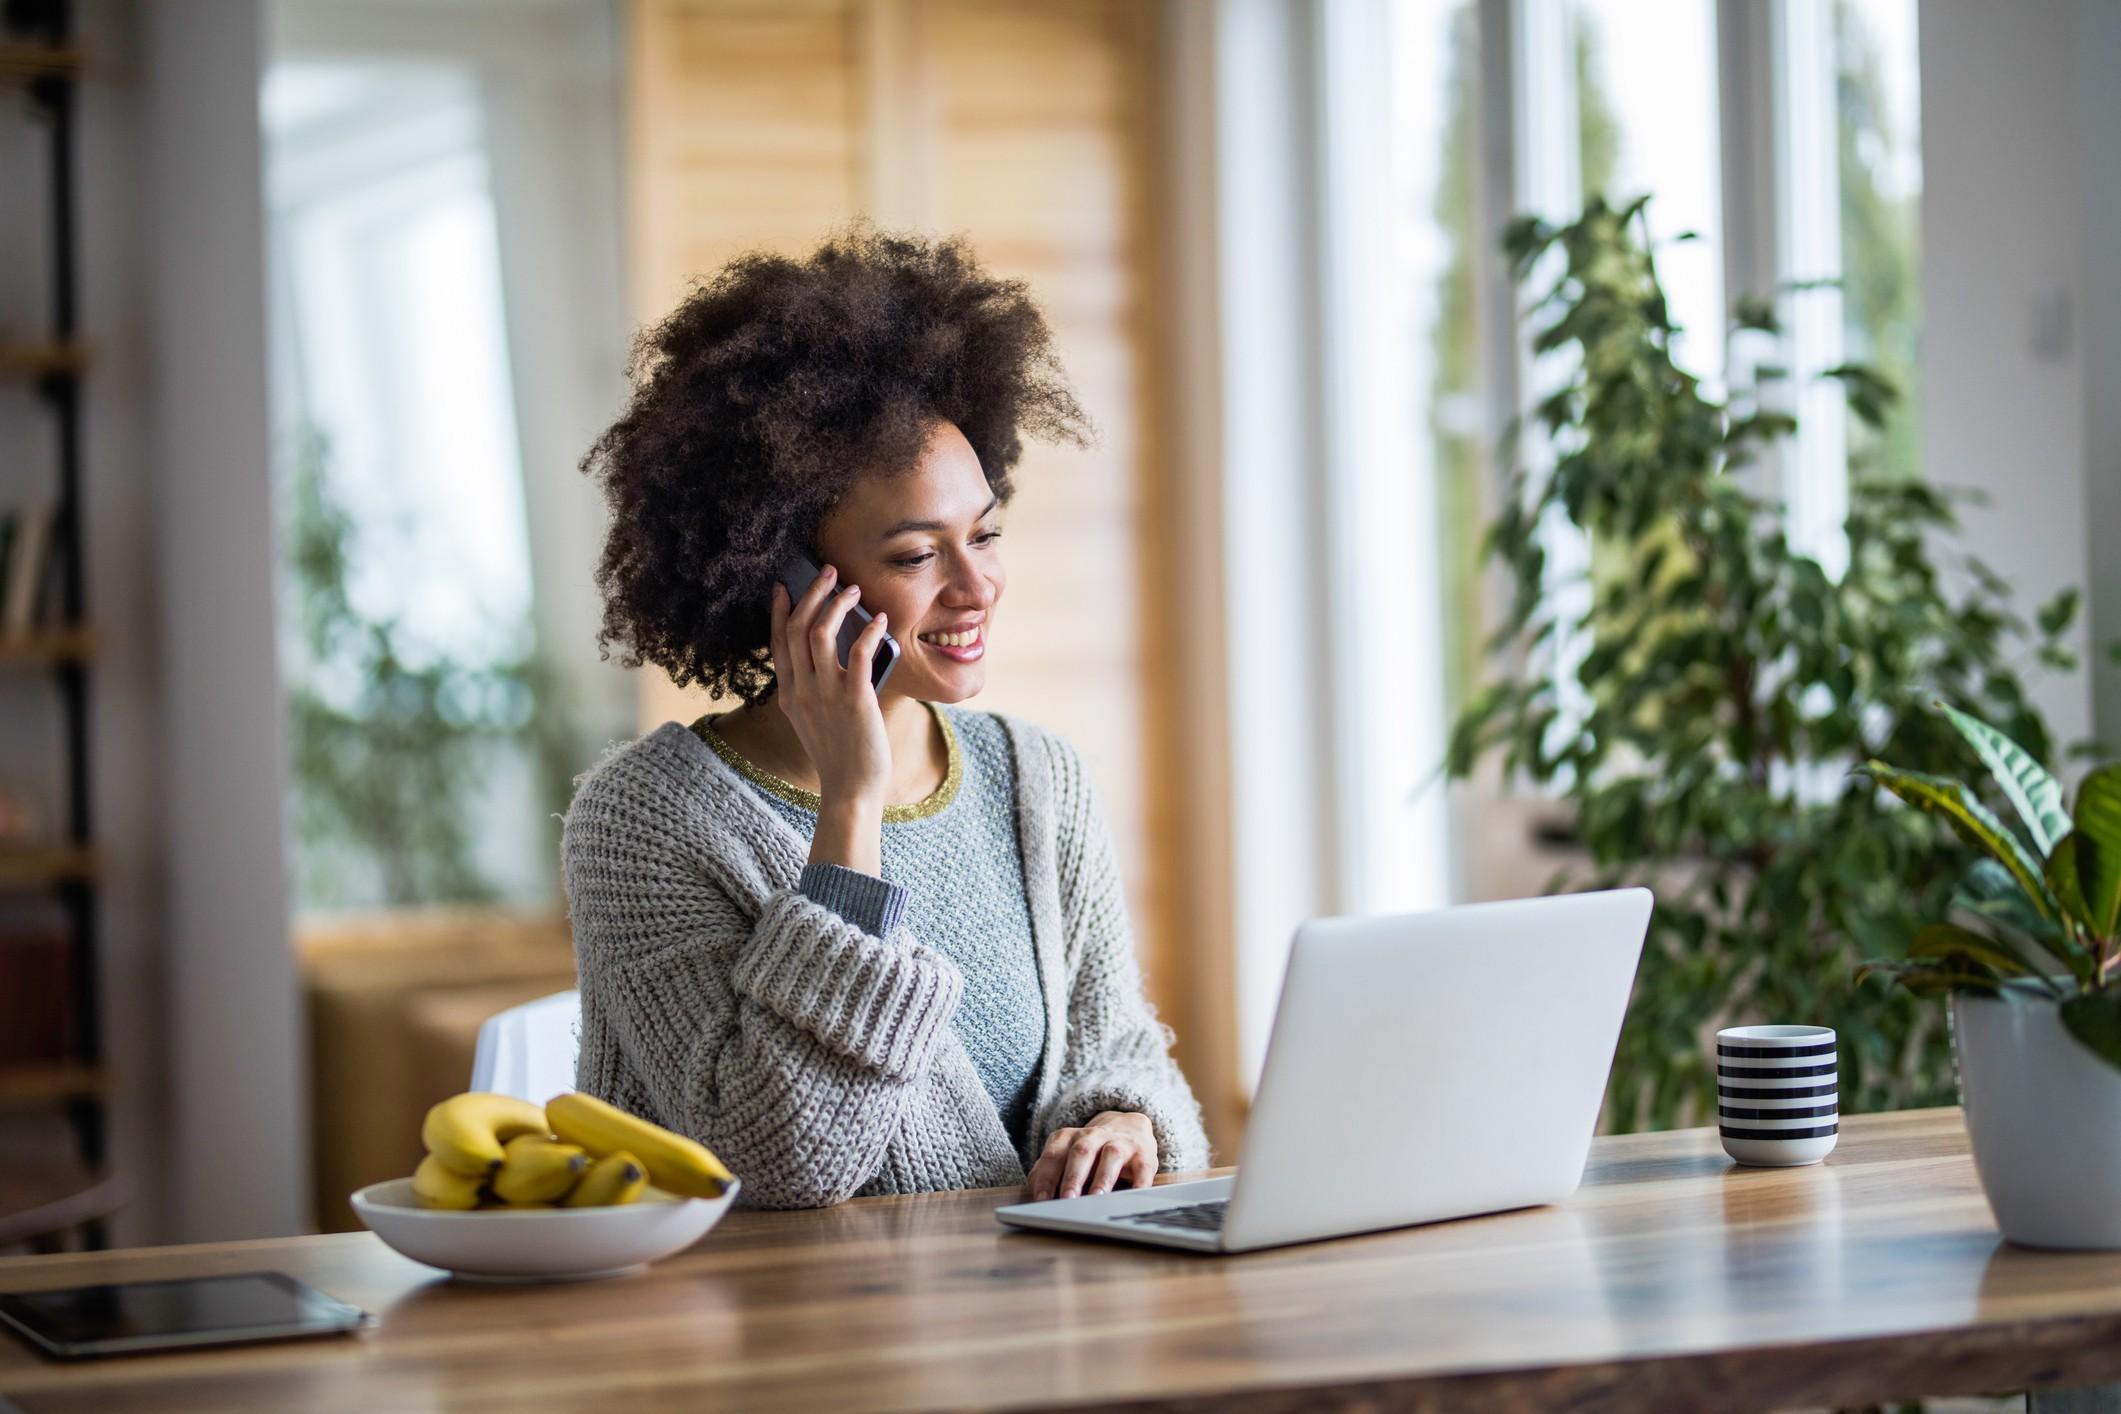 Entenda como funciona o reembolso de despesas em home office